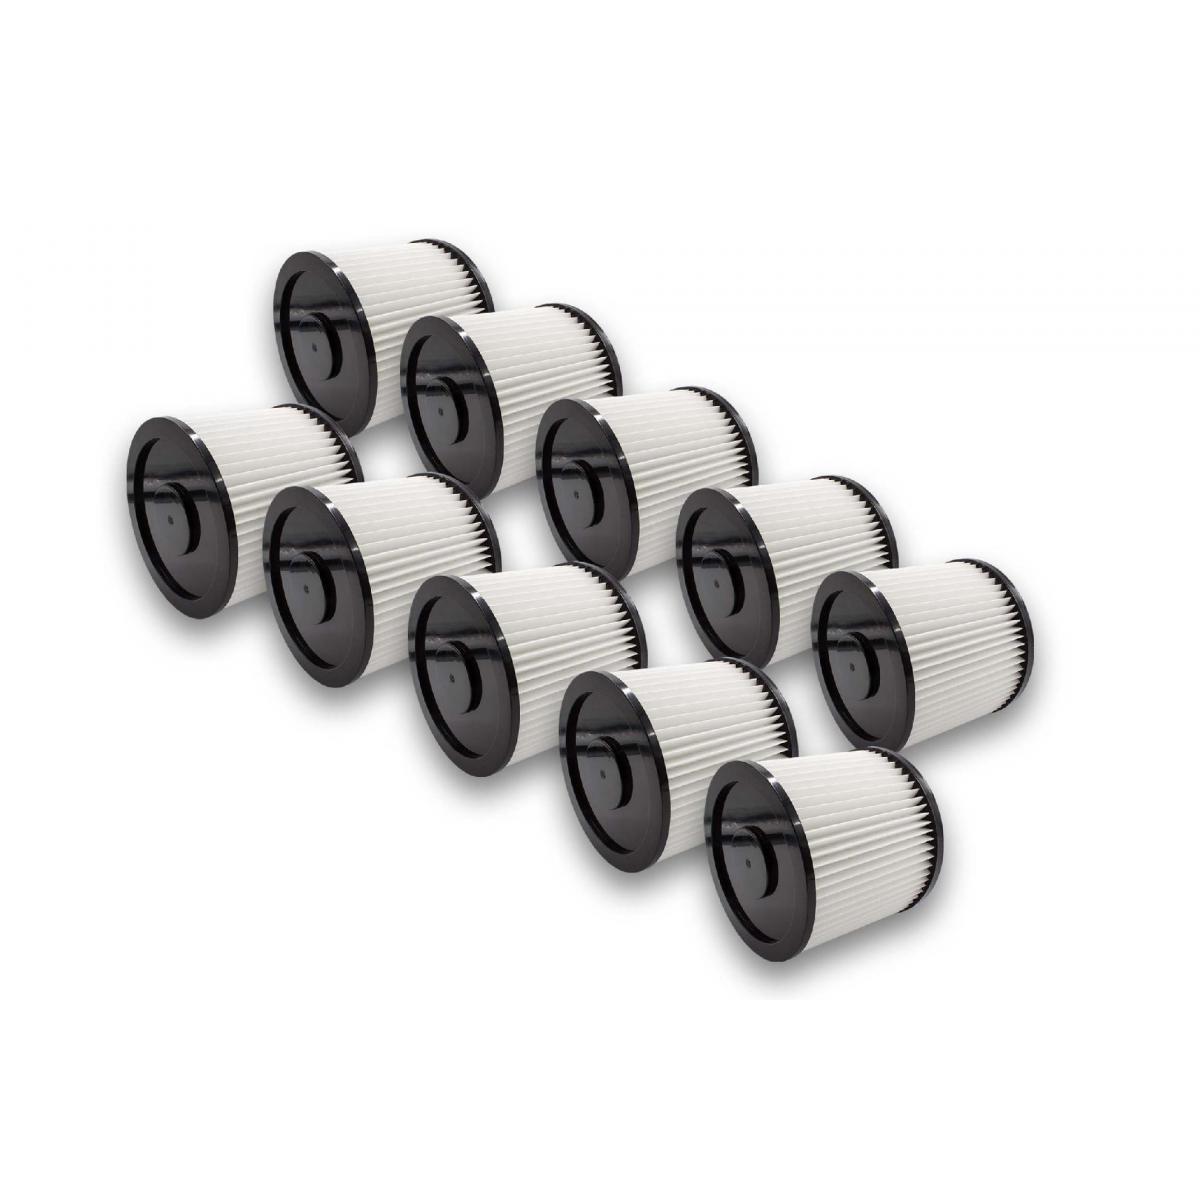 Vhbw vhbw 10x Filtre rond aspirateur compatible avec Rowenta Collecto RB 57, RB 60, RB 61, RB 70, RB 700, RB 720, RB 800 remp